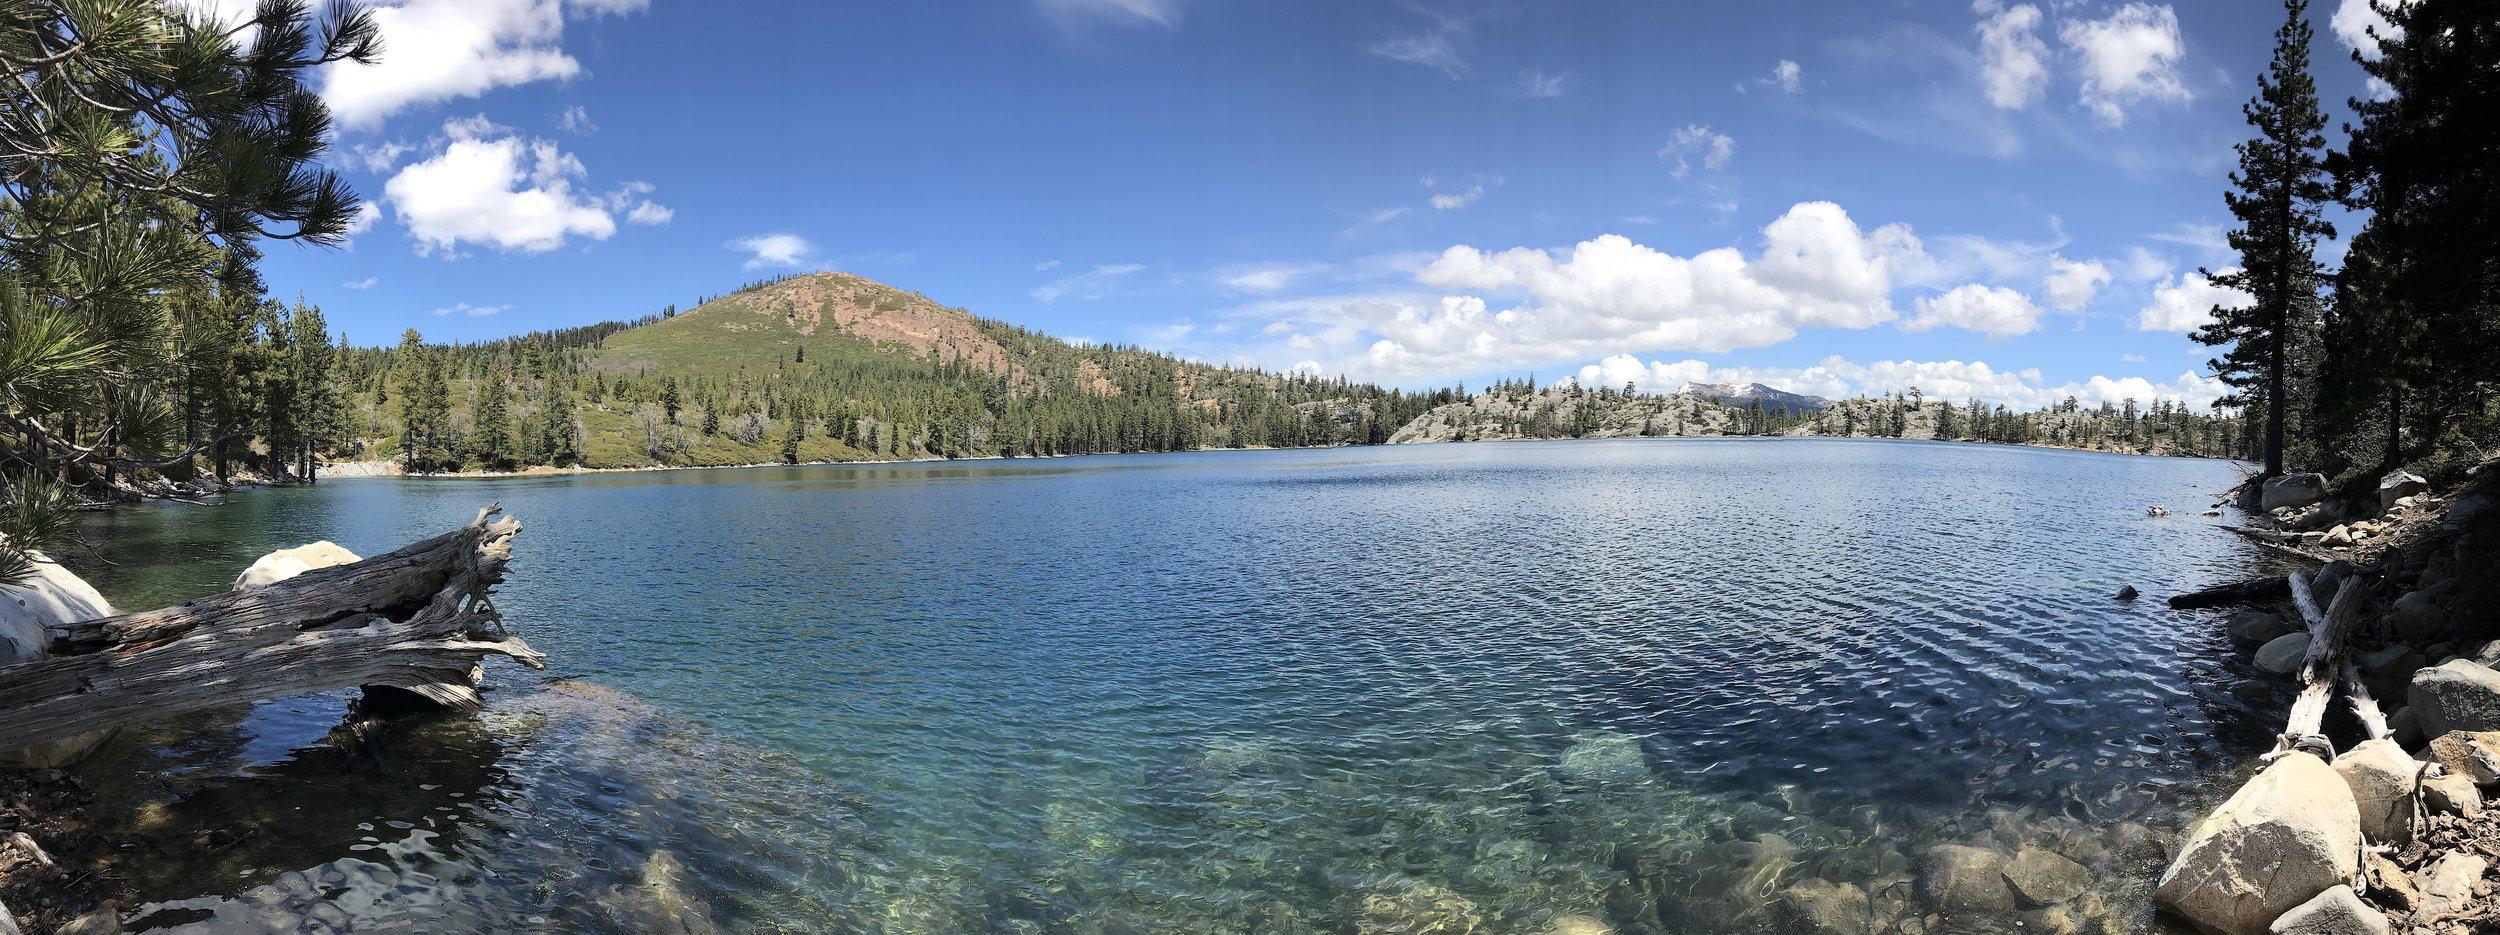 BLUE LAKE, CALIFORNIA